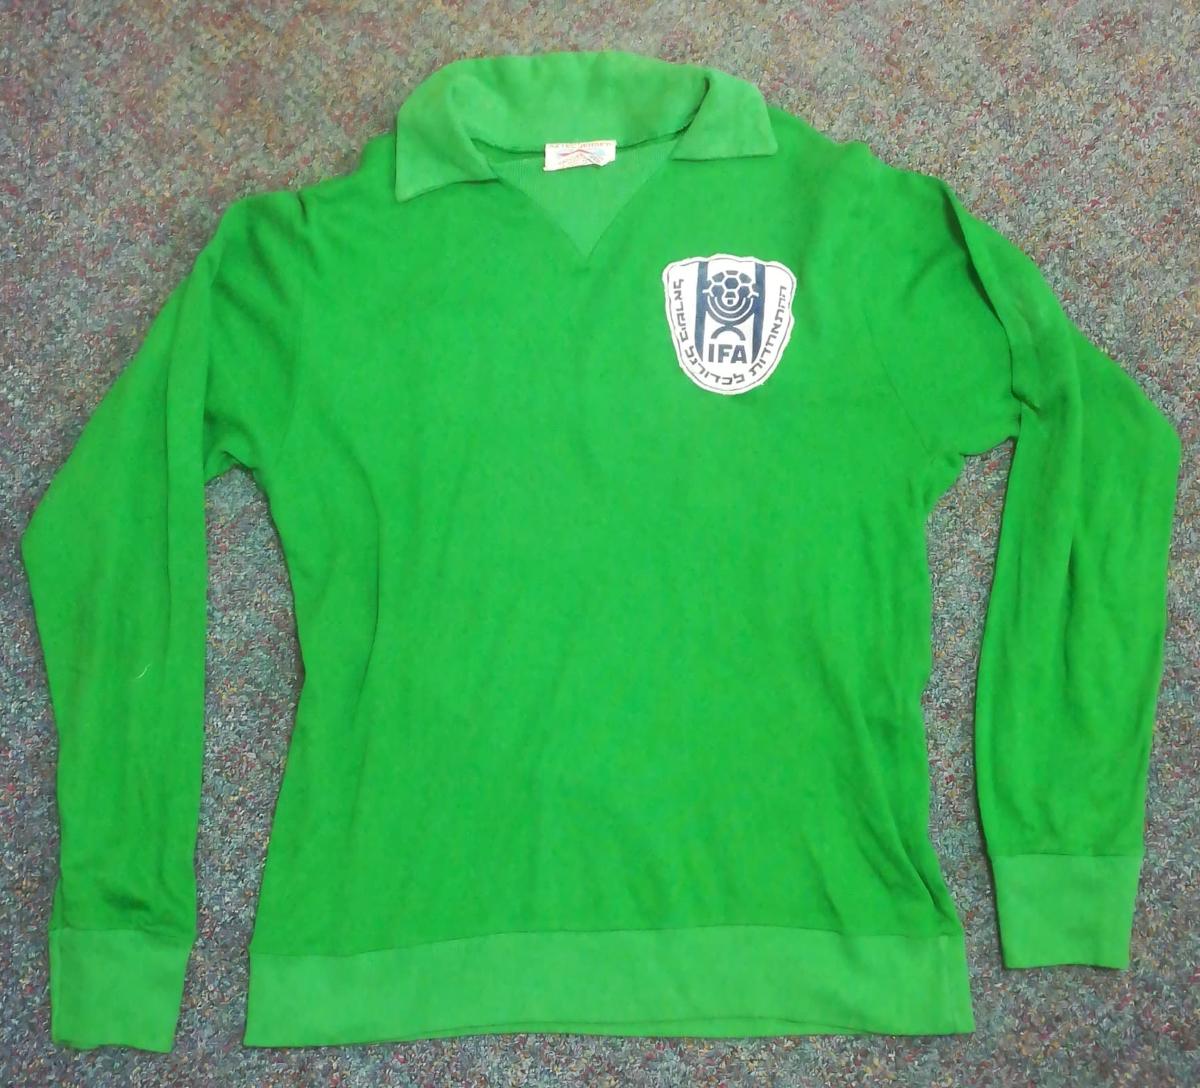 Israel matchworn shirt collector